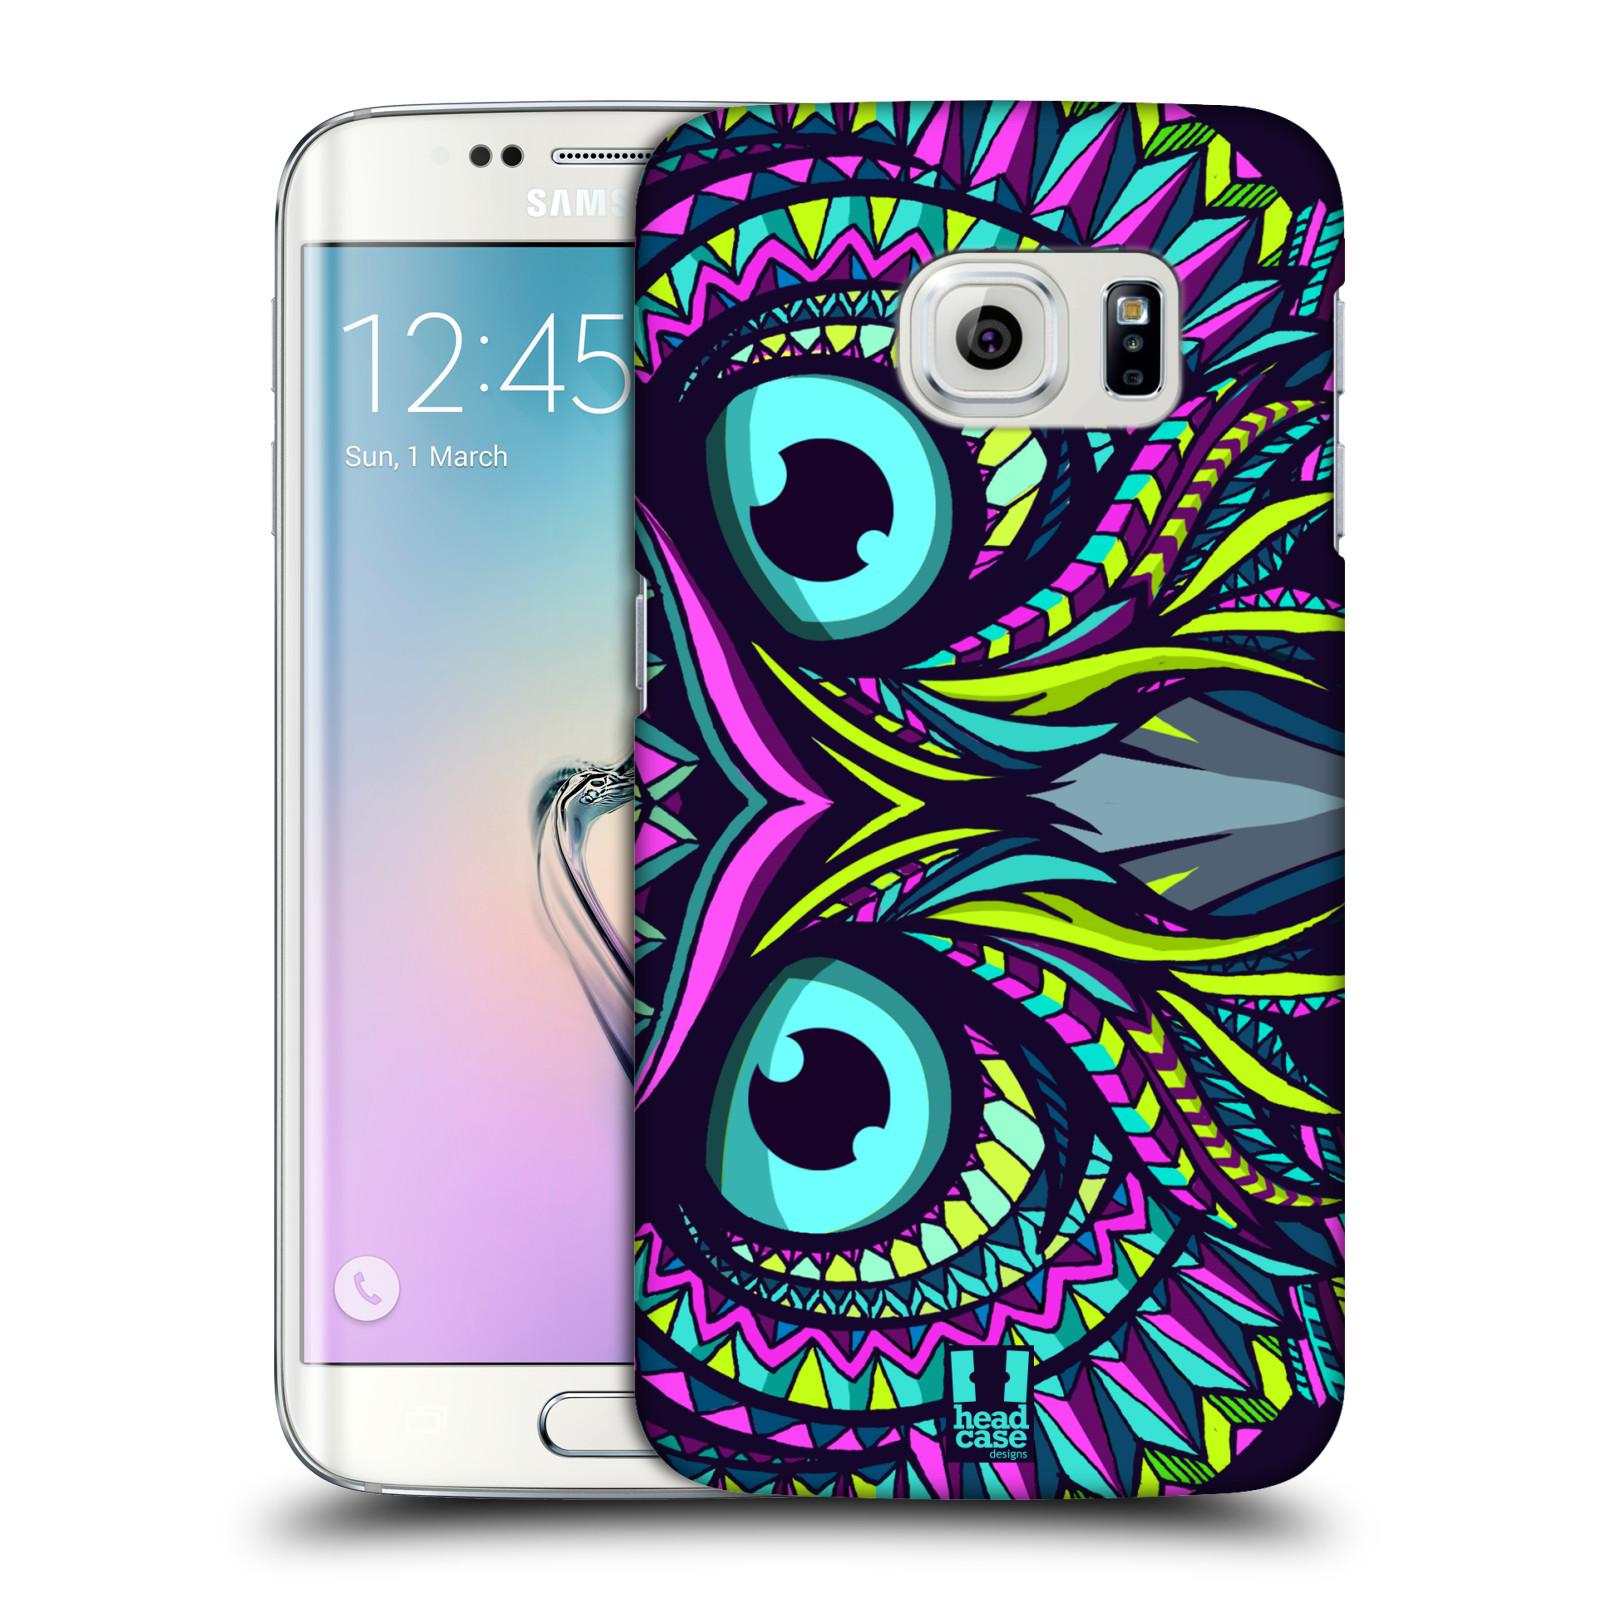 HEAD CASE plastový obal na mobil SAMSUNG Galaxy S6 EDGE (G9250, G925, G925F) vzor Aztécký motiv zvíře sova